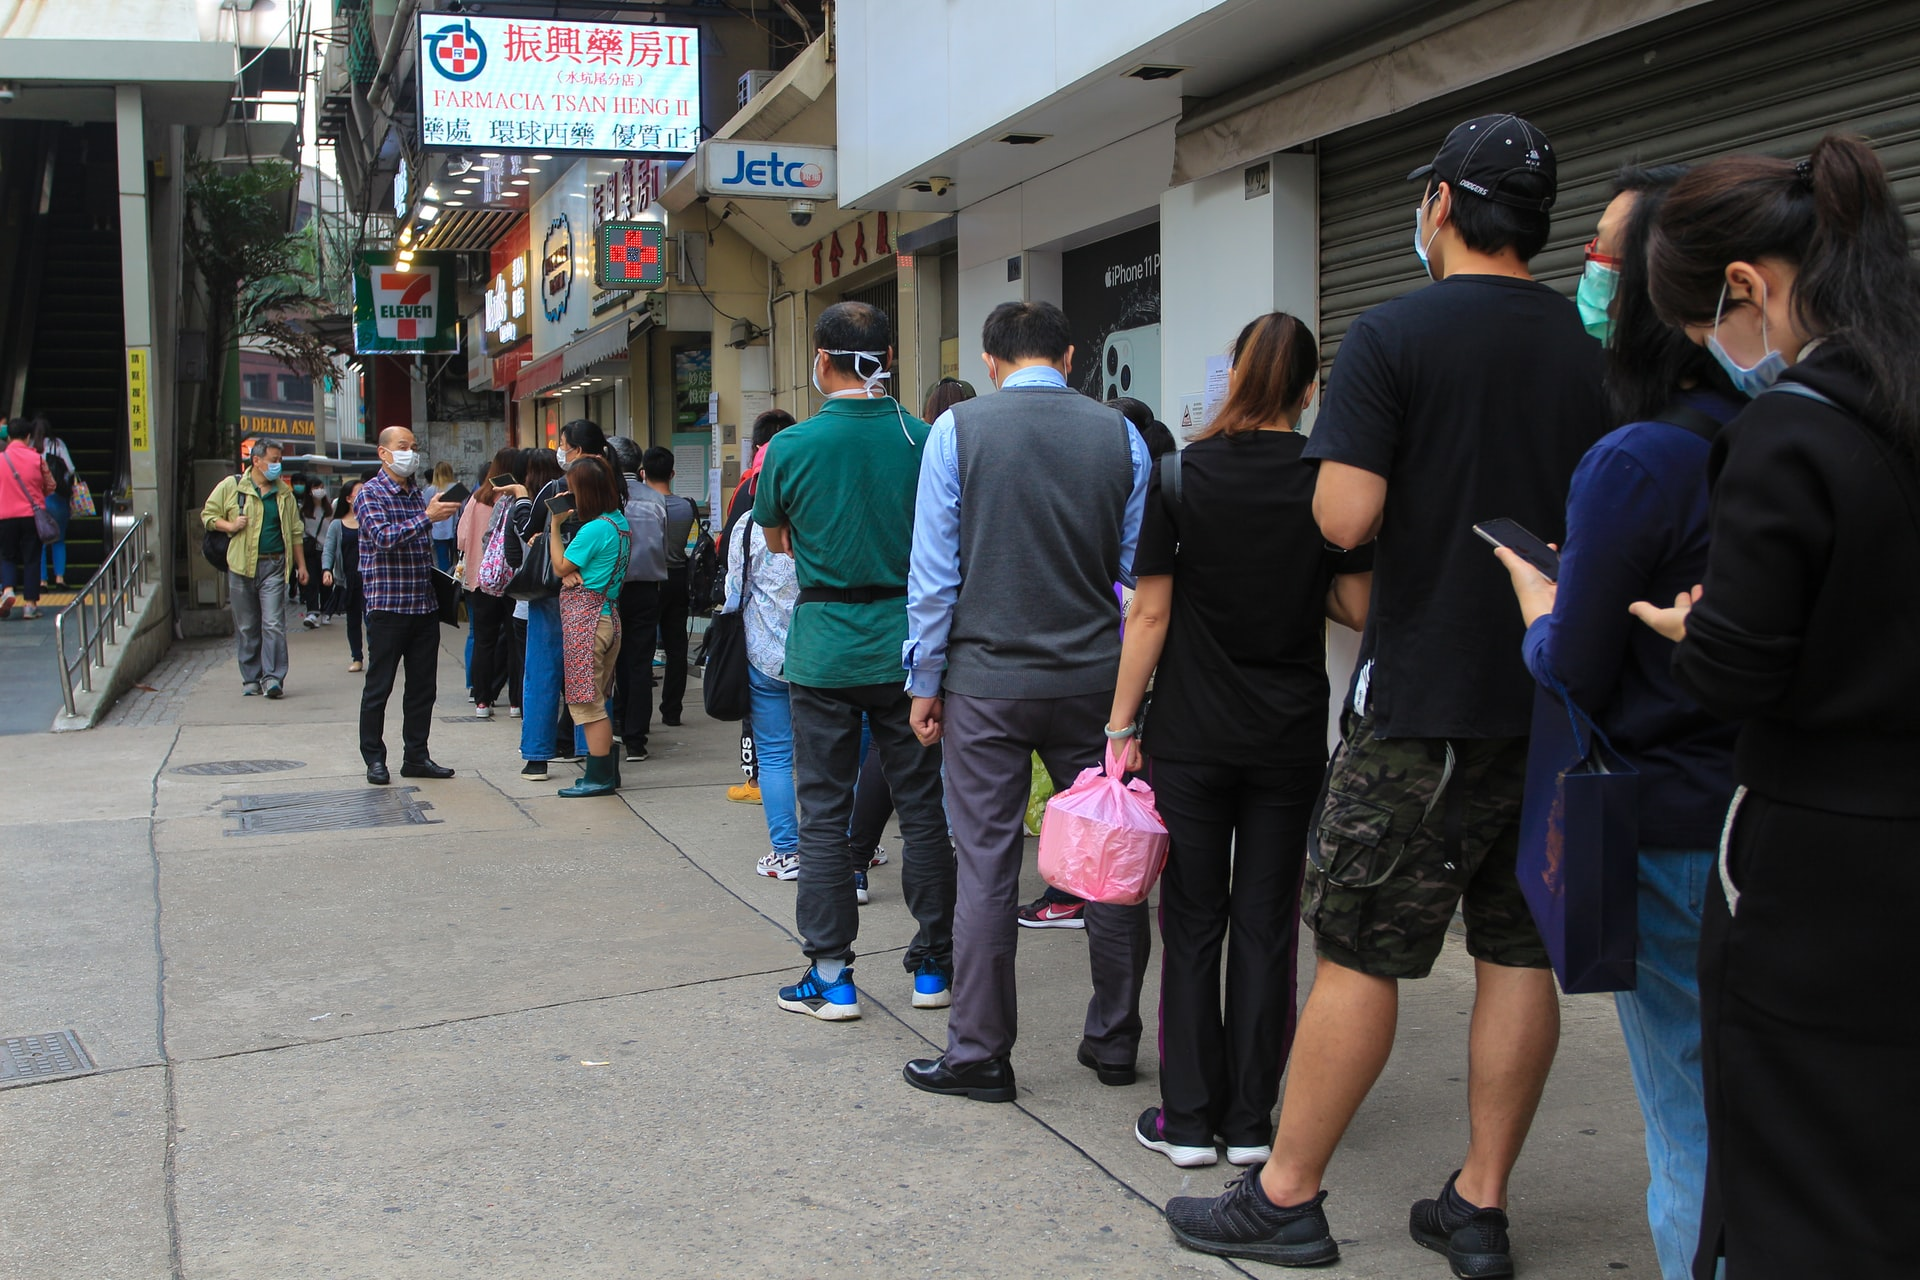 No Mask, No Shopping Pandemic Retail Rules